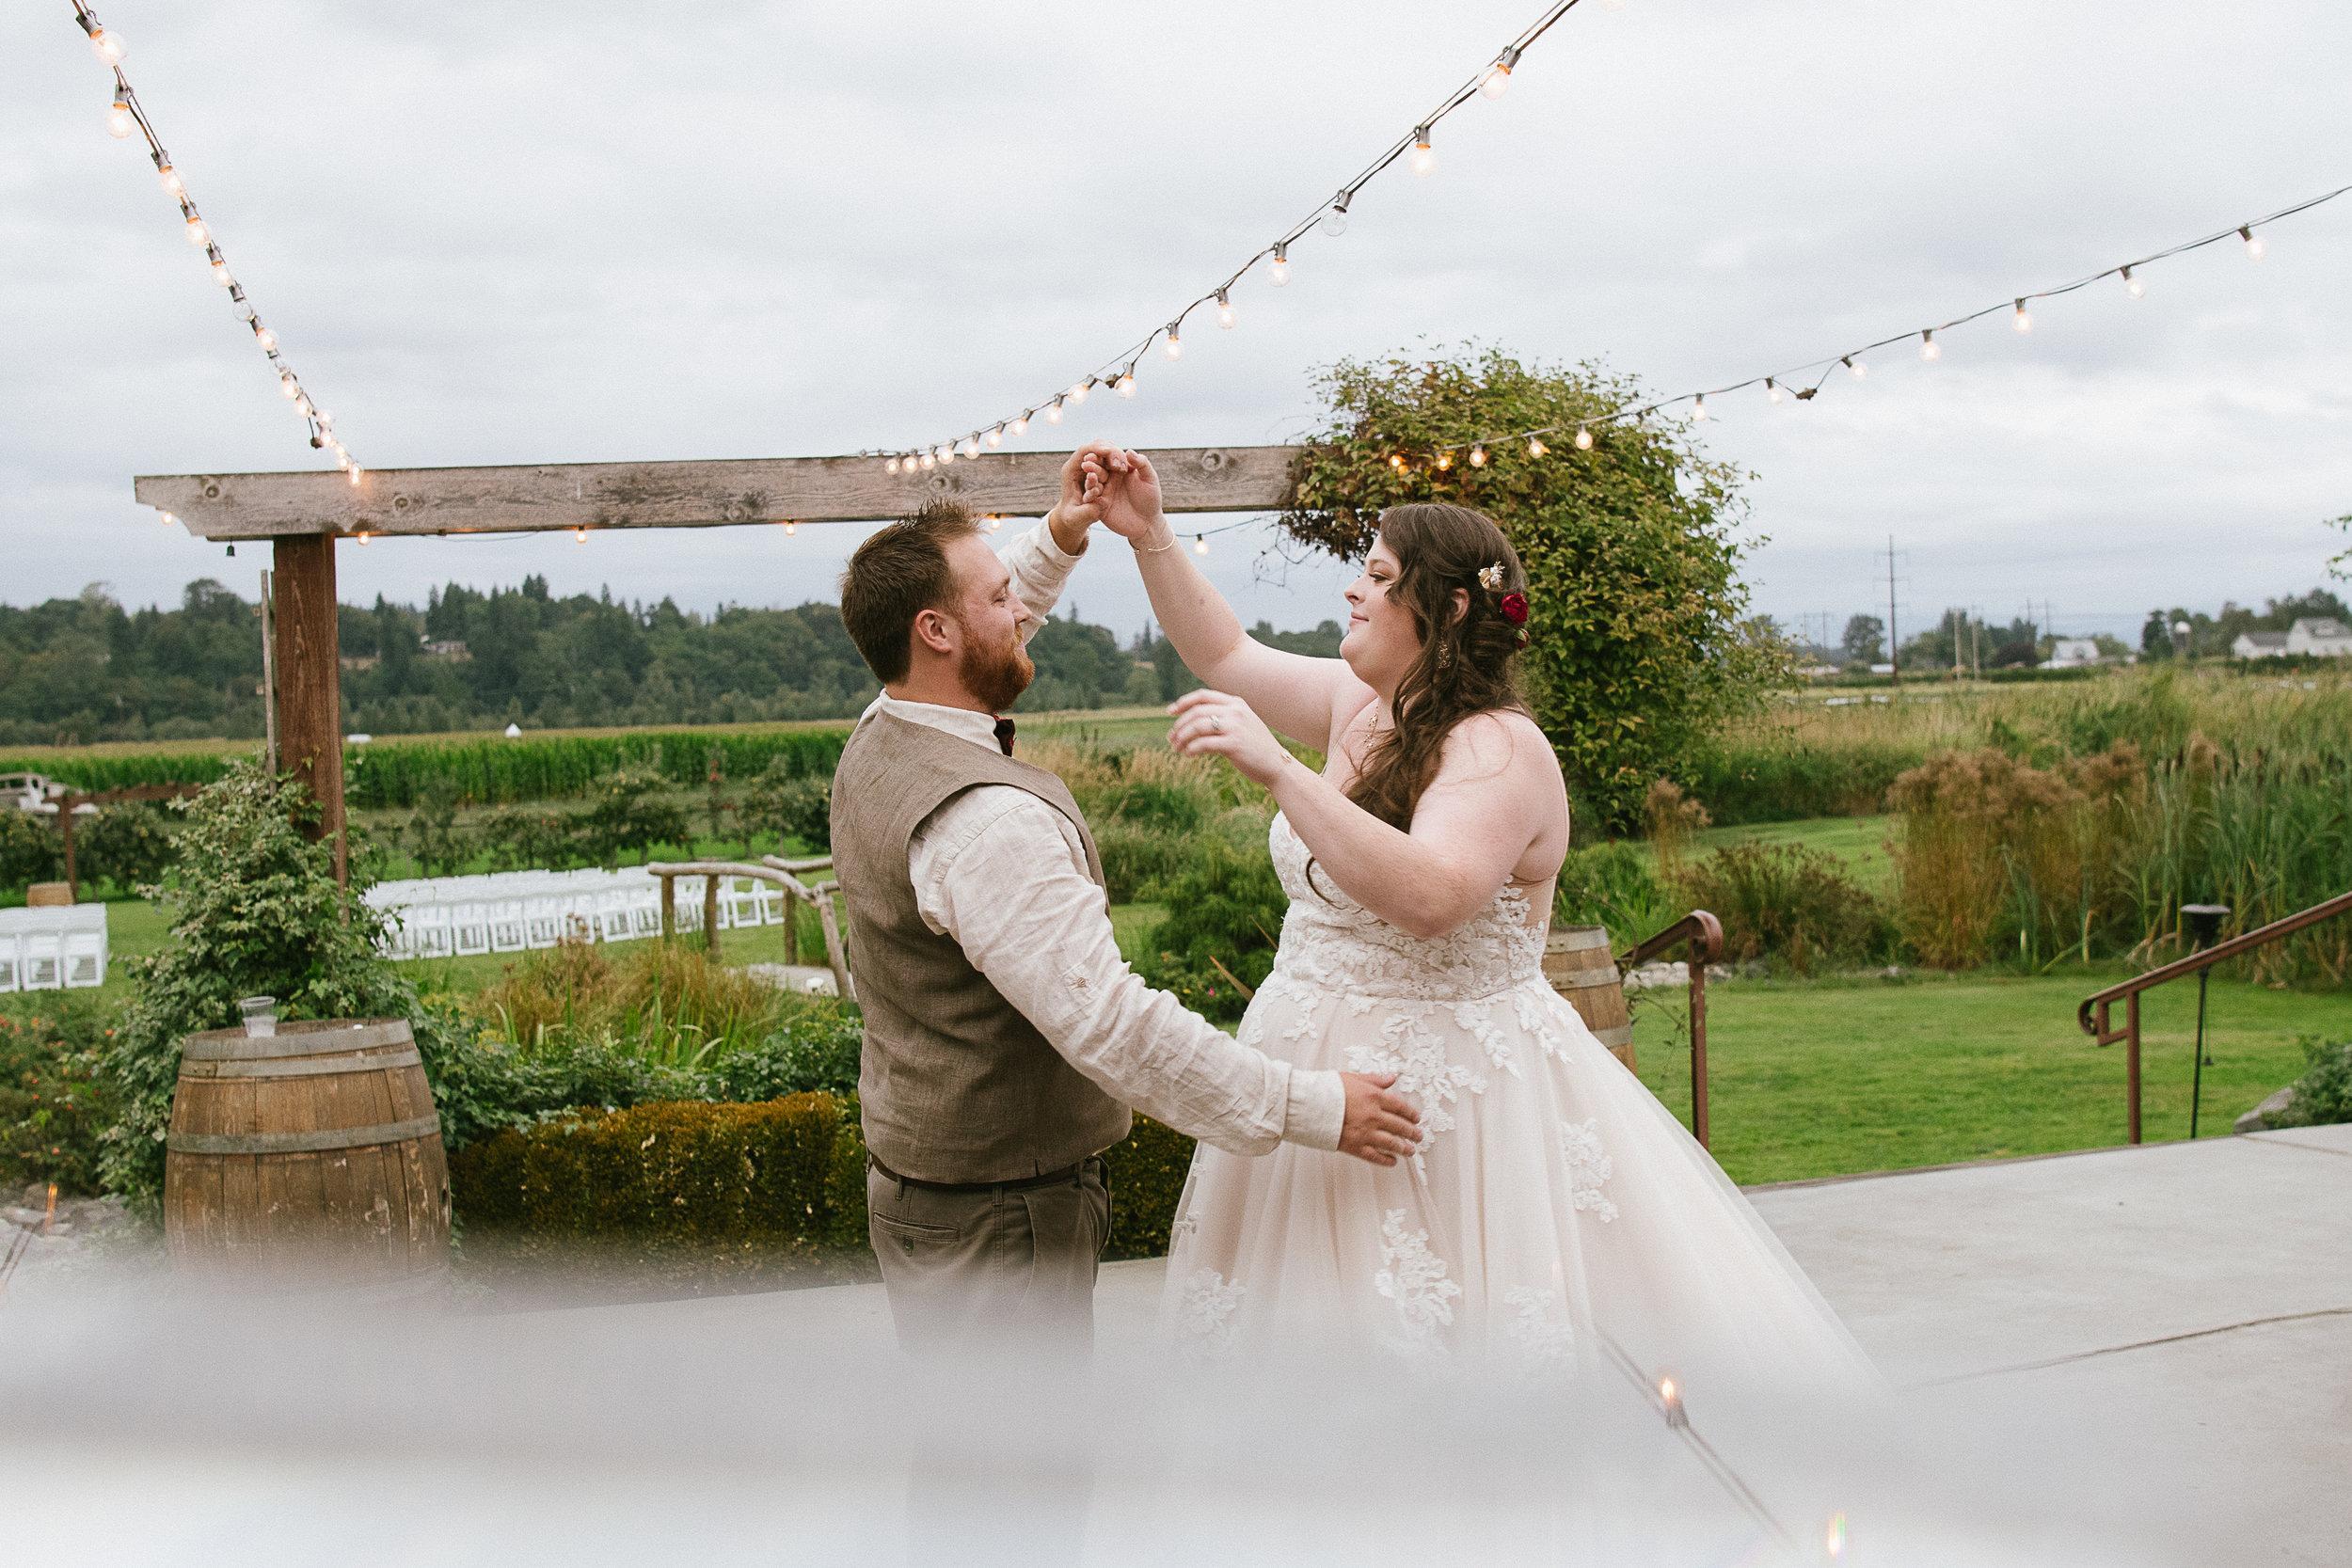 Swan Trail Farm Wedding_Sarah Schurman + Brian Skadan_Snohomish Wedding_Kelsey Lane Photography-6599.jpg